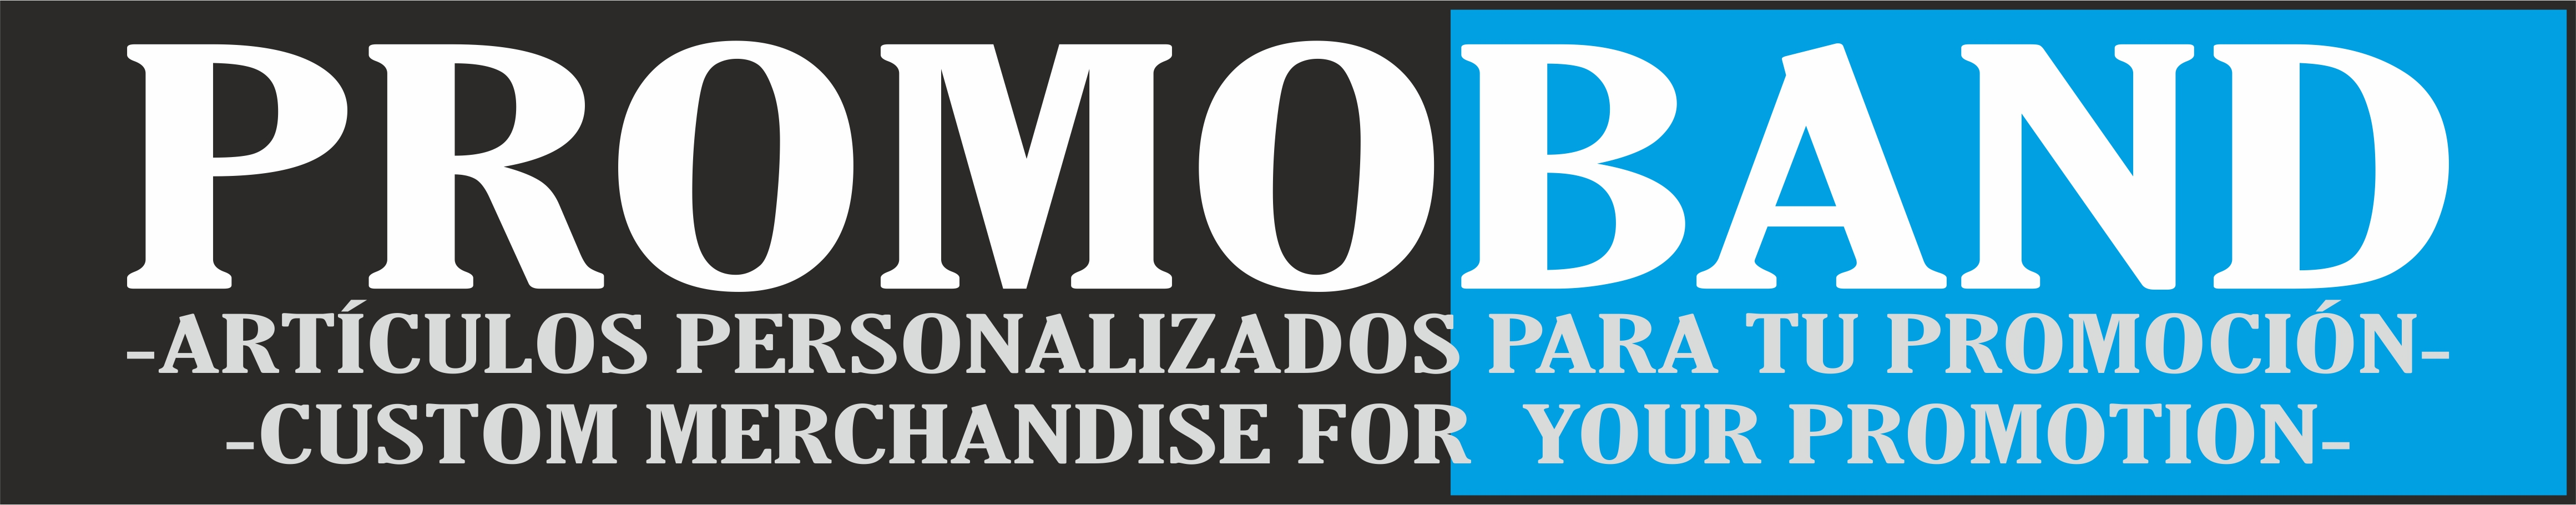 Promoband.es